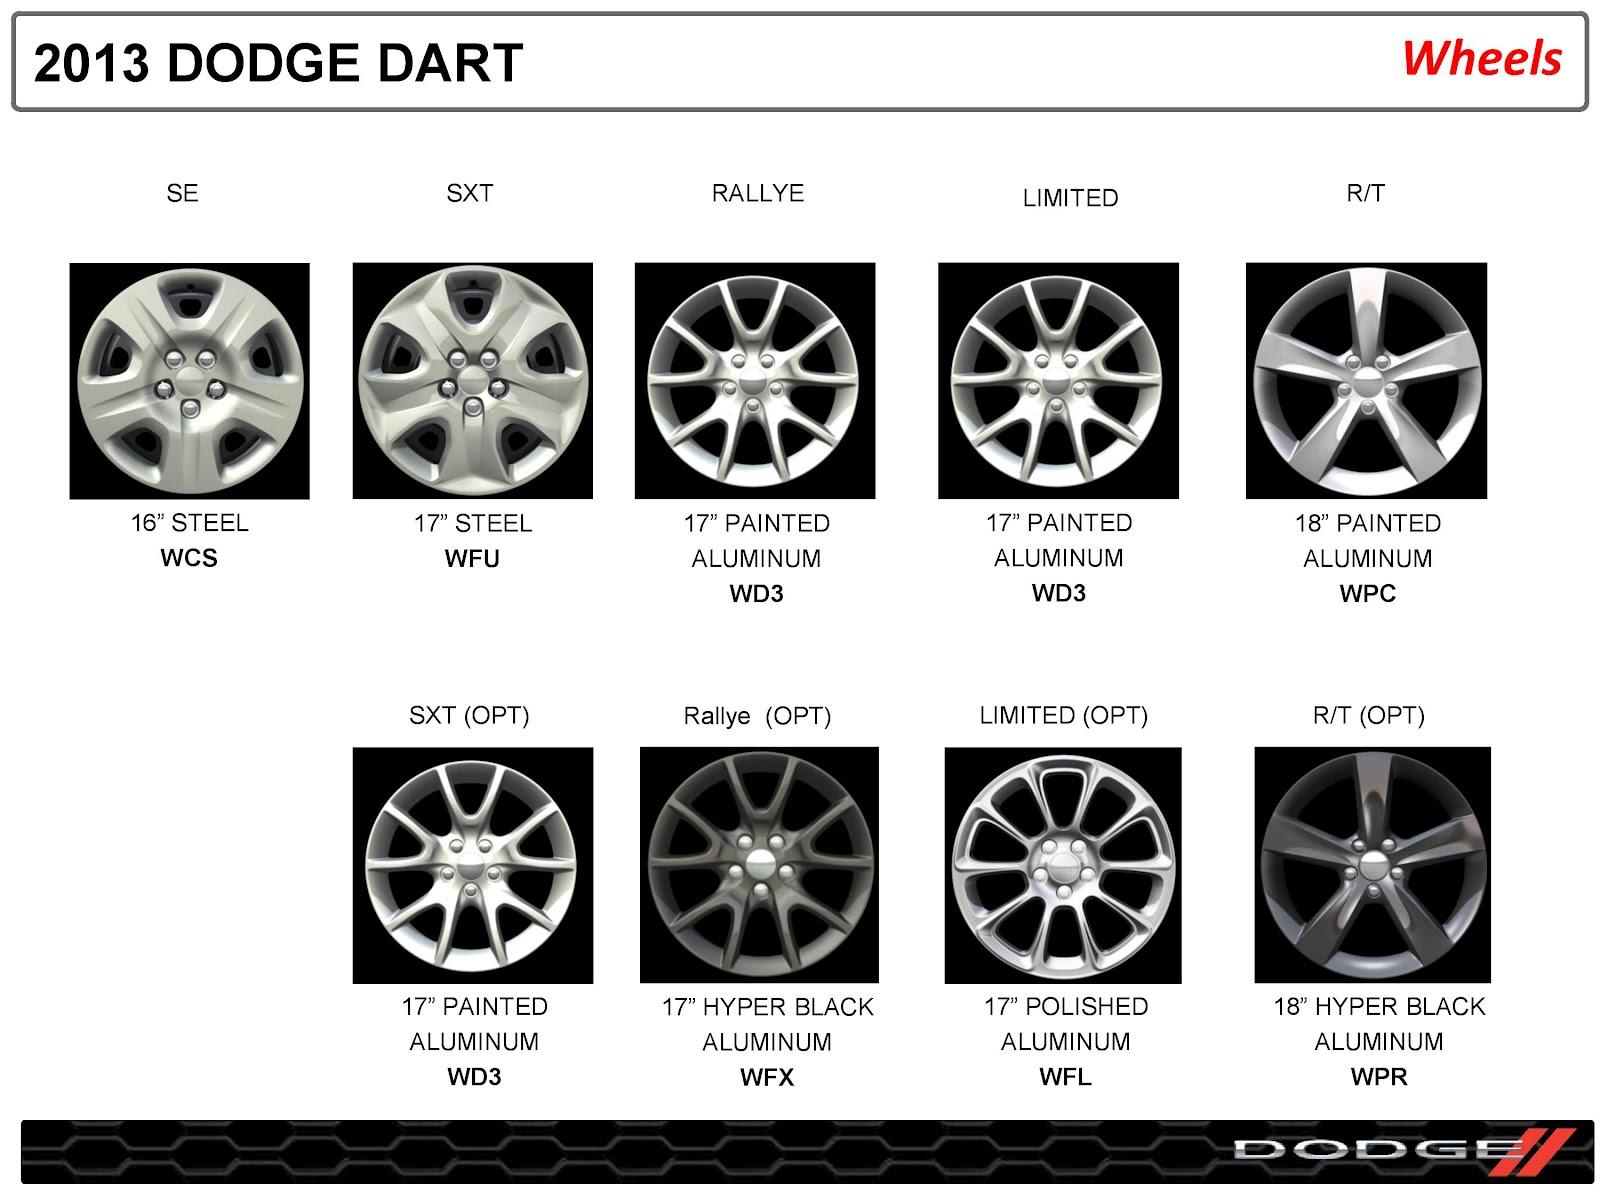 Official Dodge Dart Headquarters Website Dodge